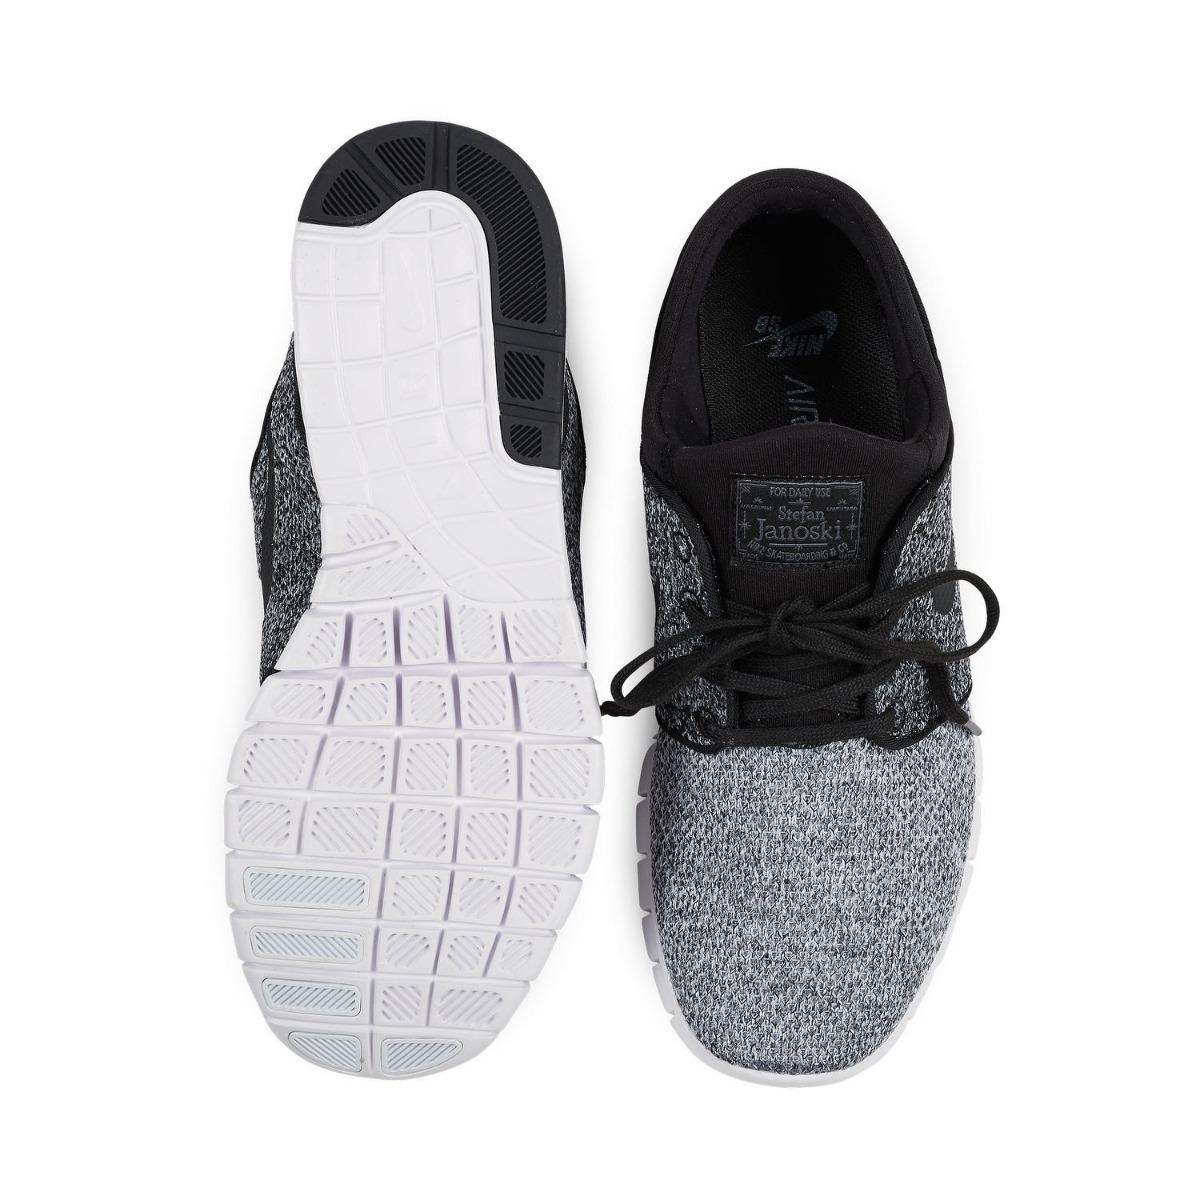 online store 8717f f7ac2 zapatillas nike stefan janoski max negro blanco 102 hombre. Cargando zoom.